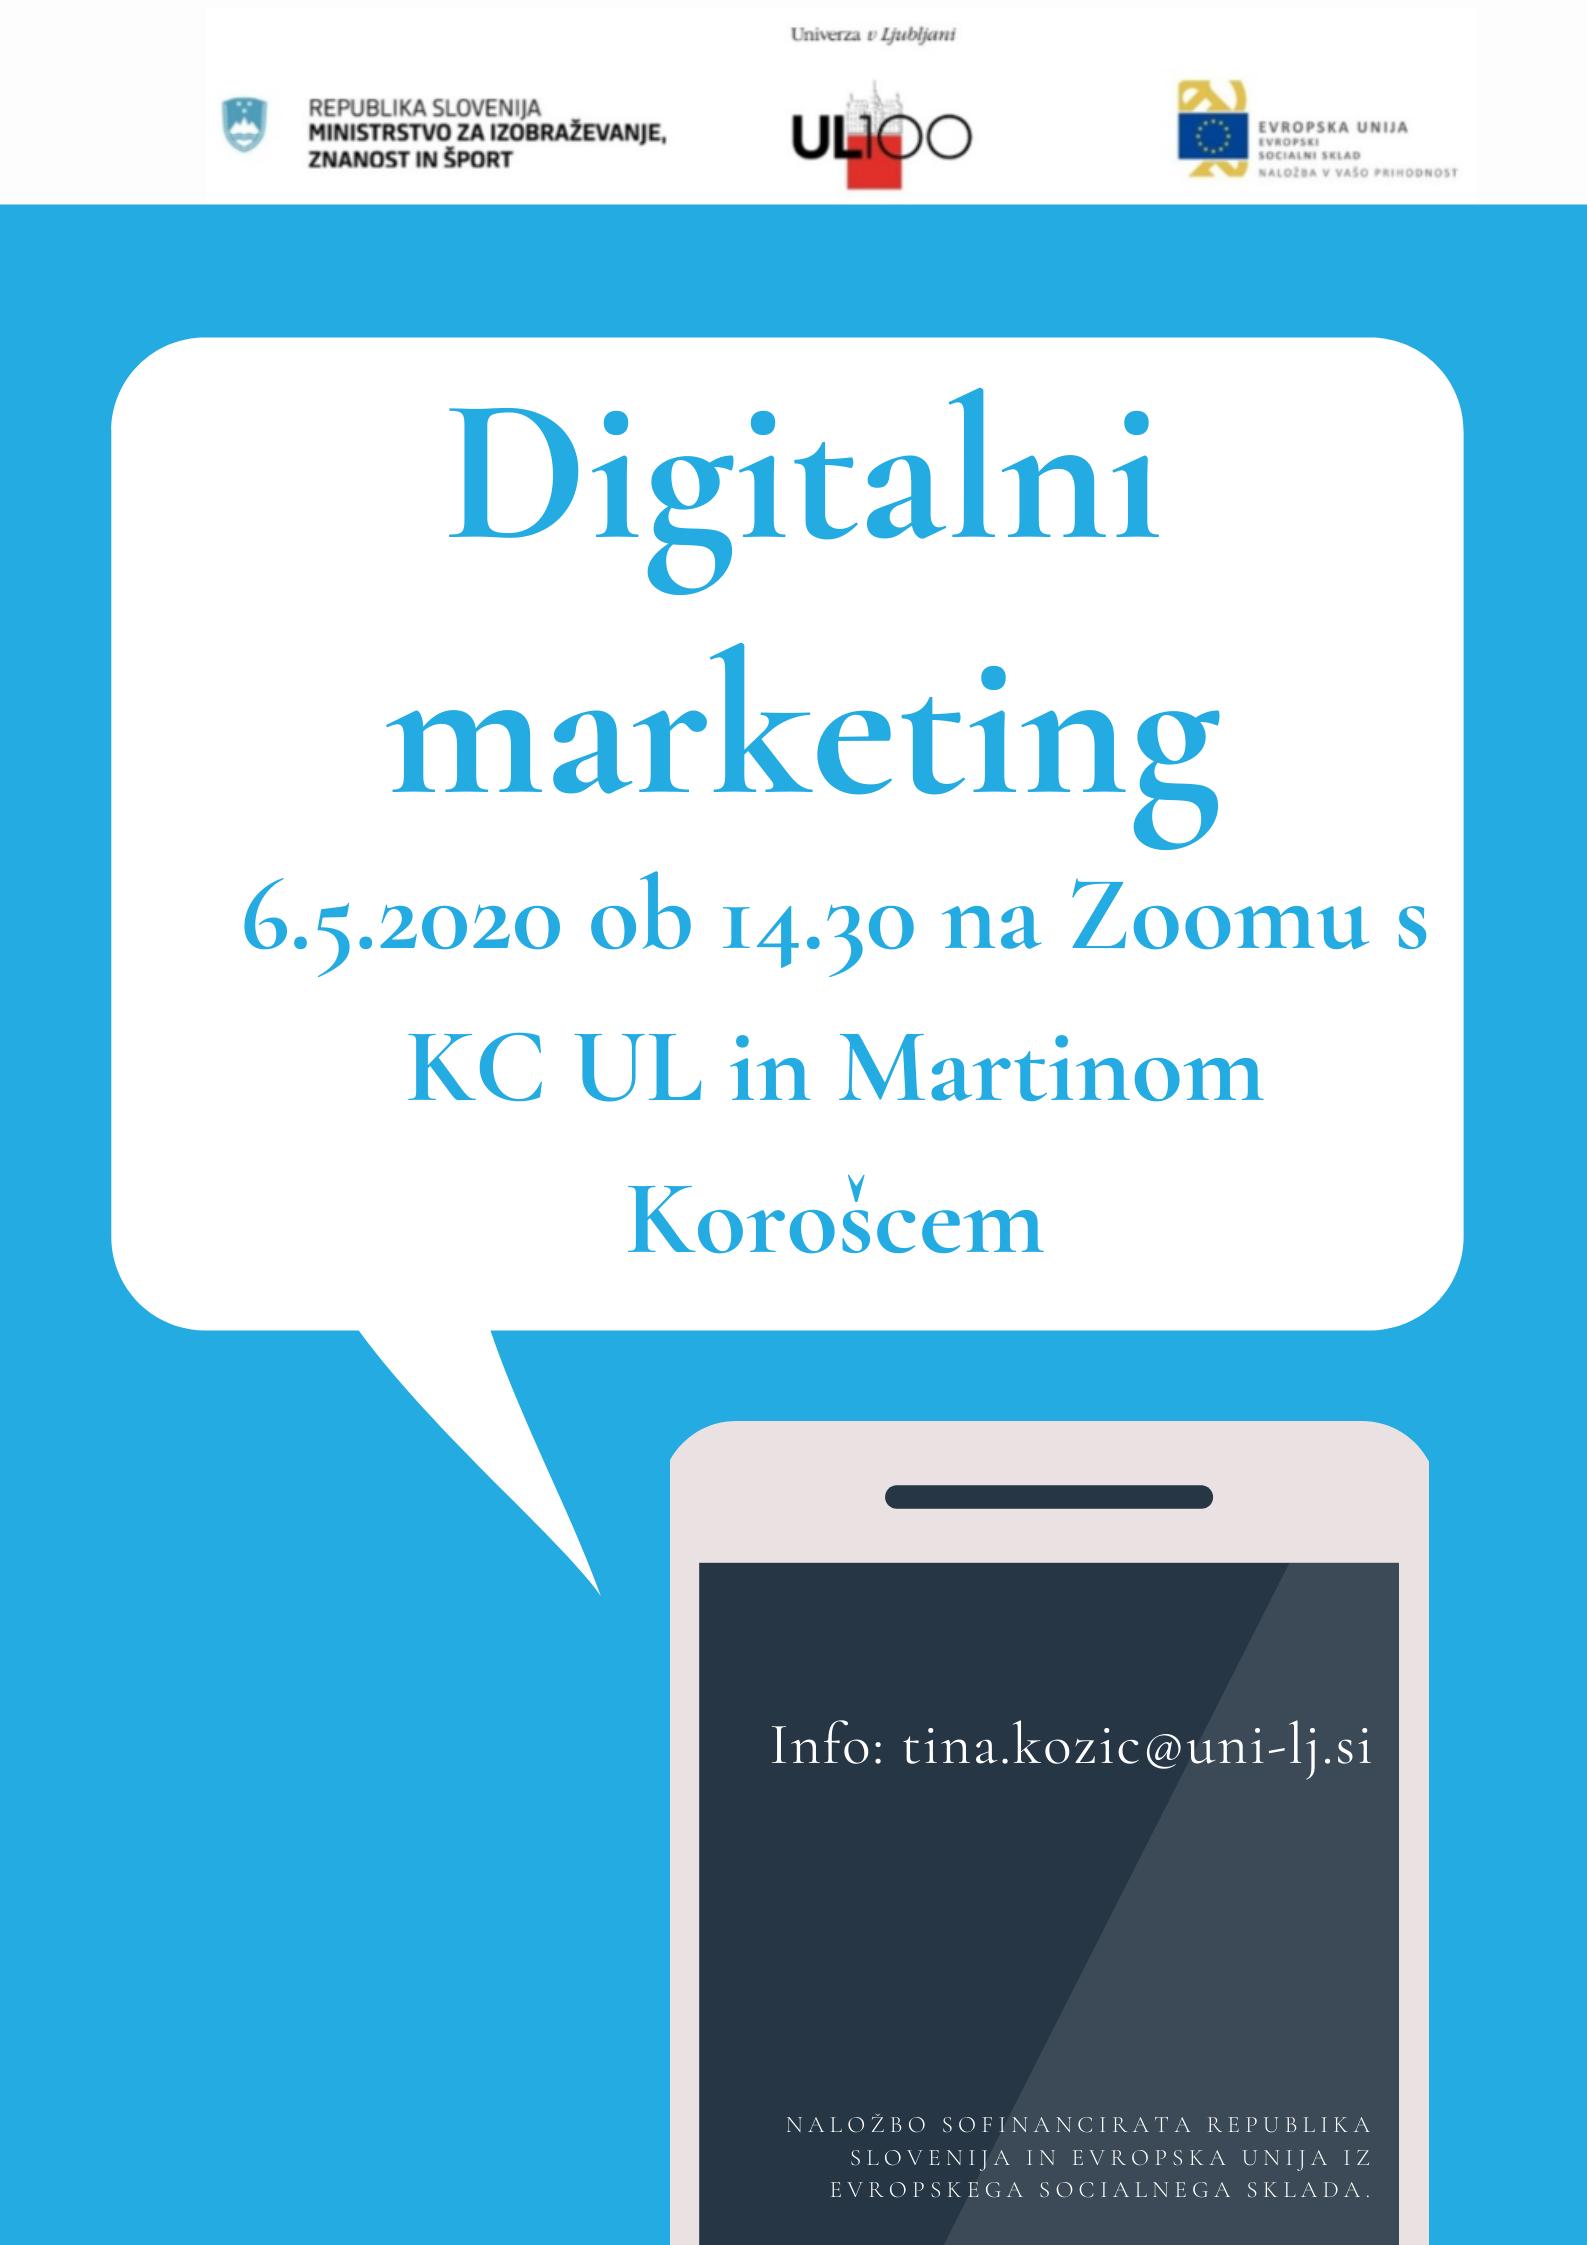 Digitalni marketing 6.5.